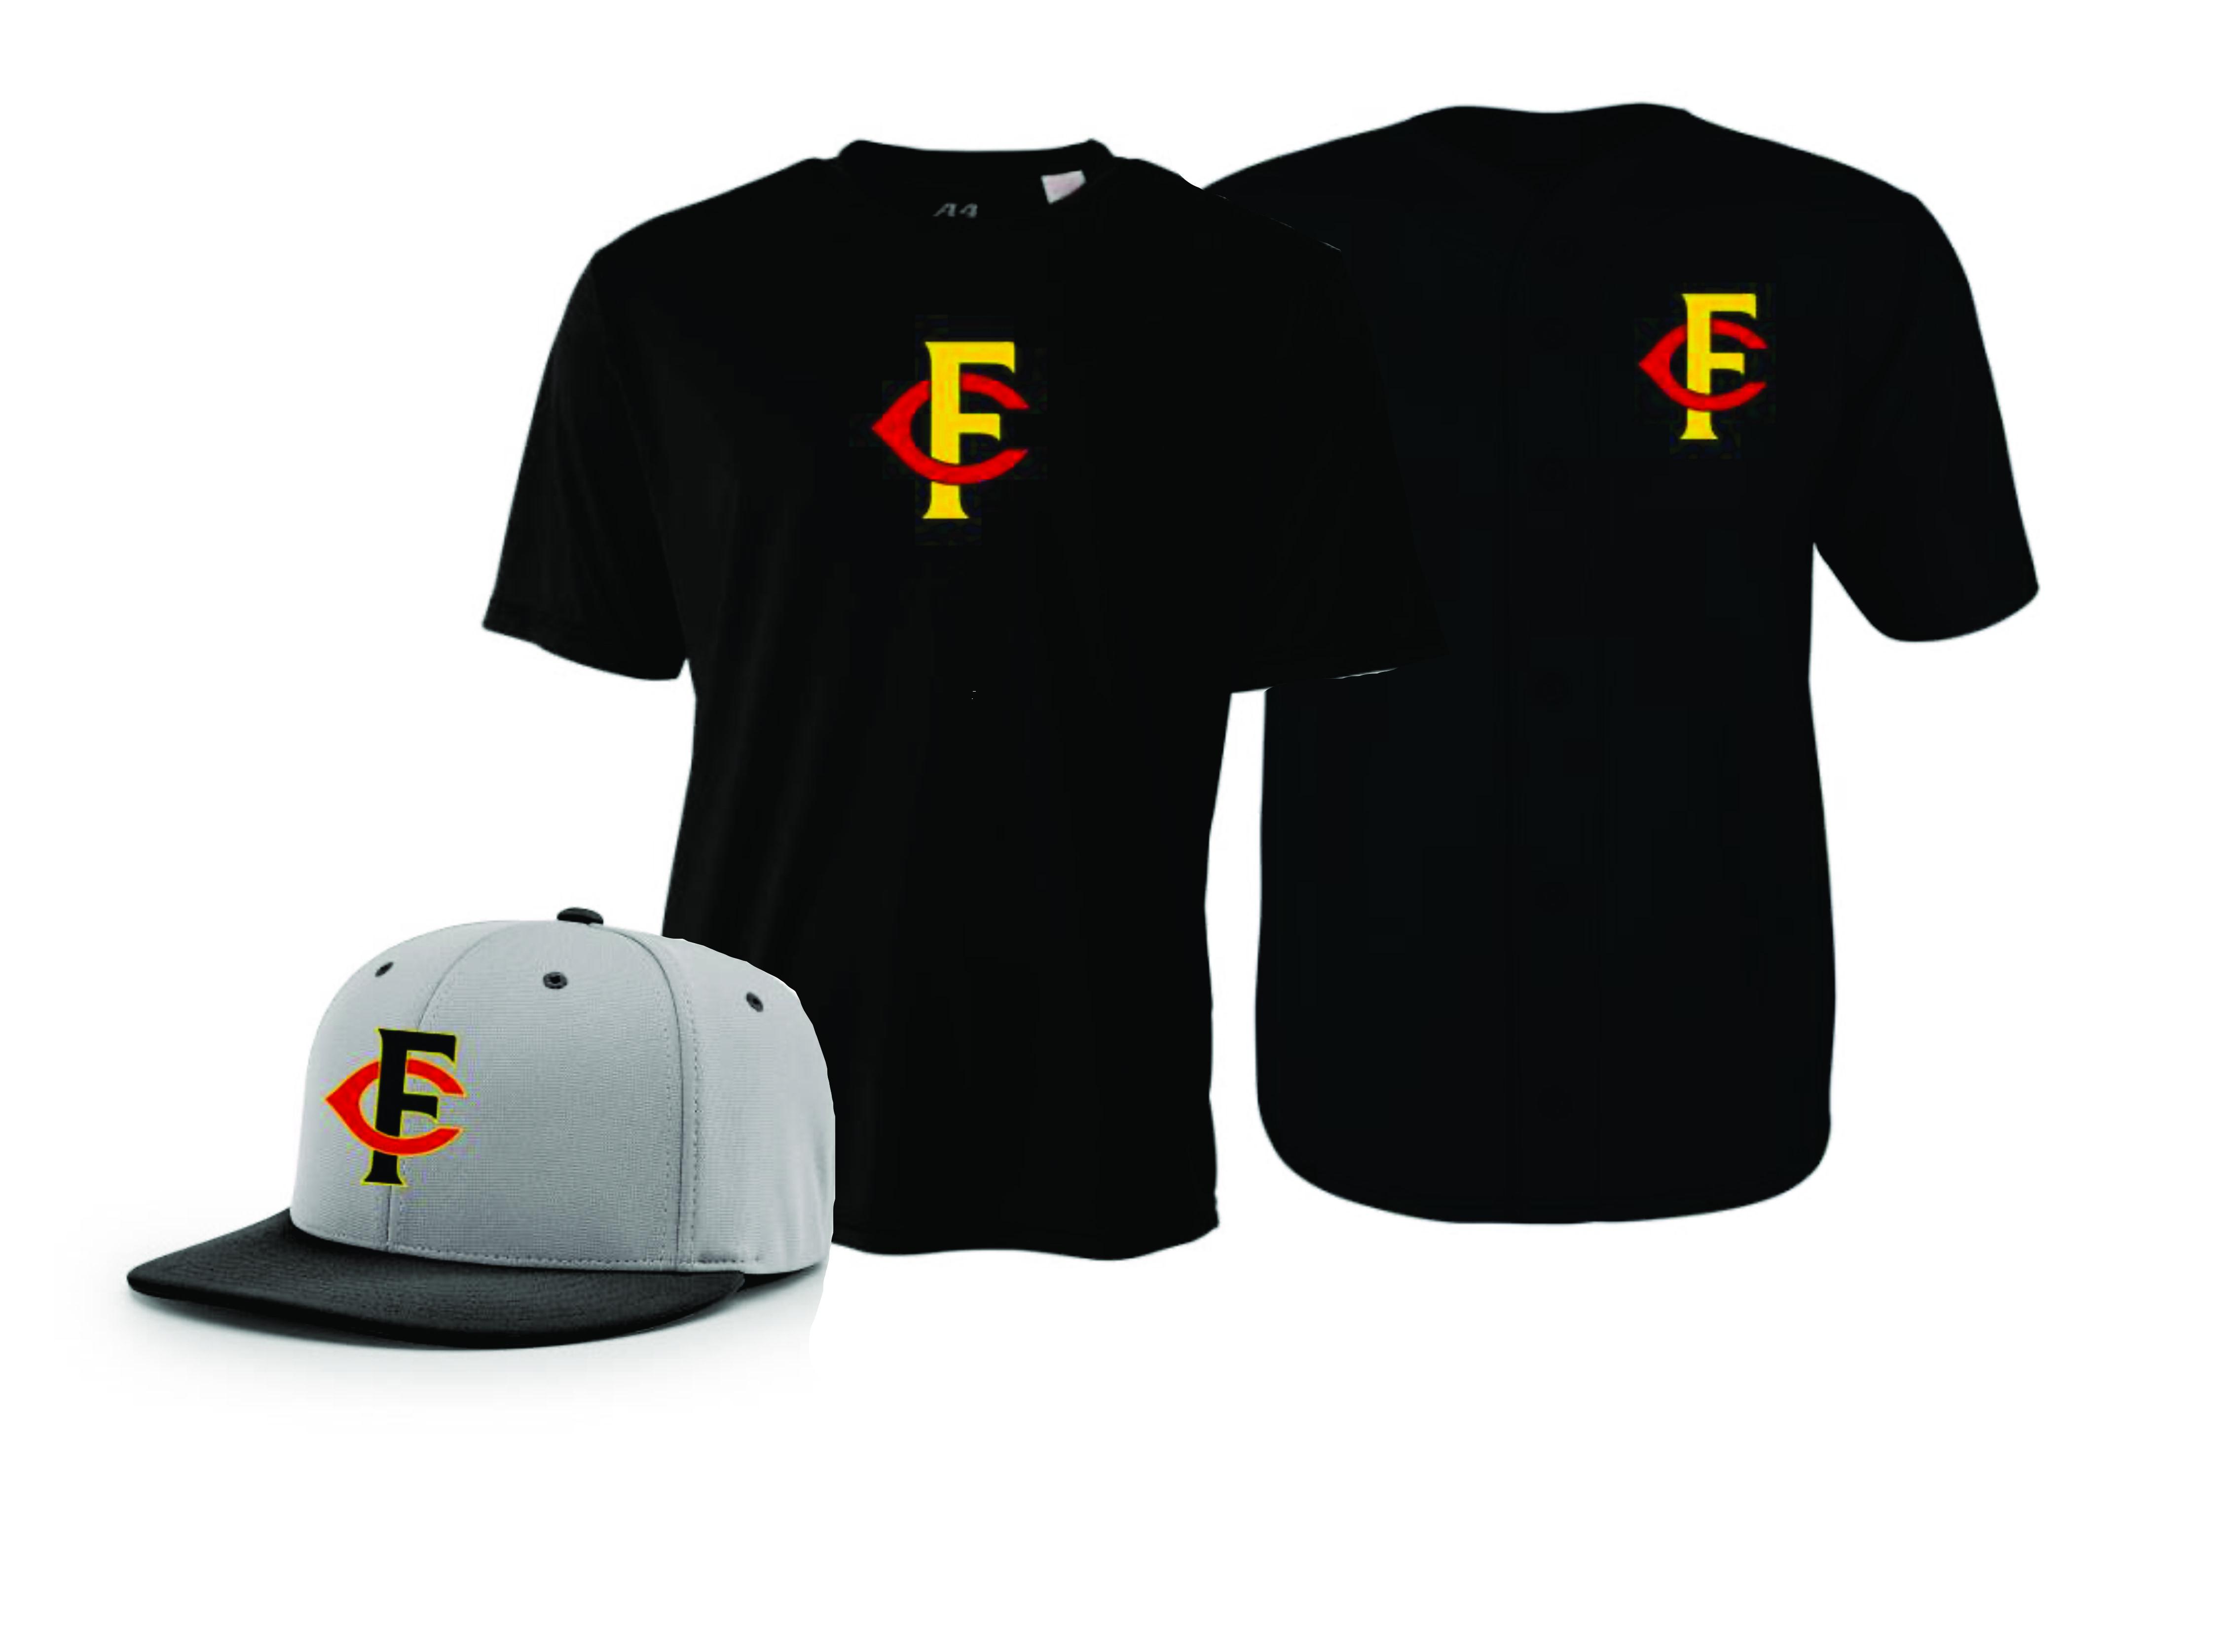 fairview-clifton-order-now.jpg